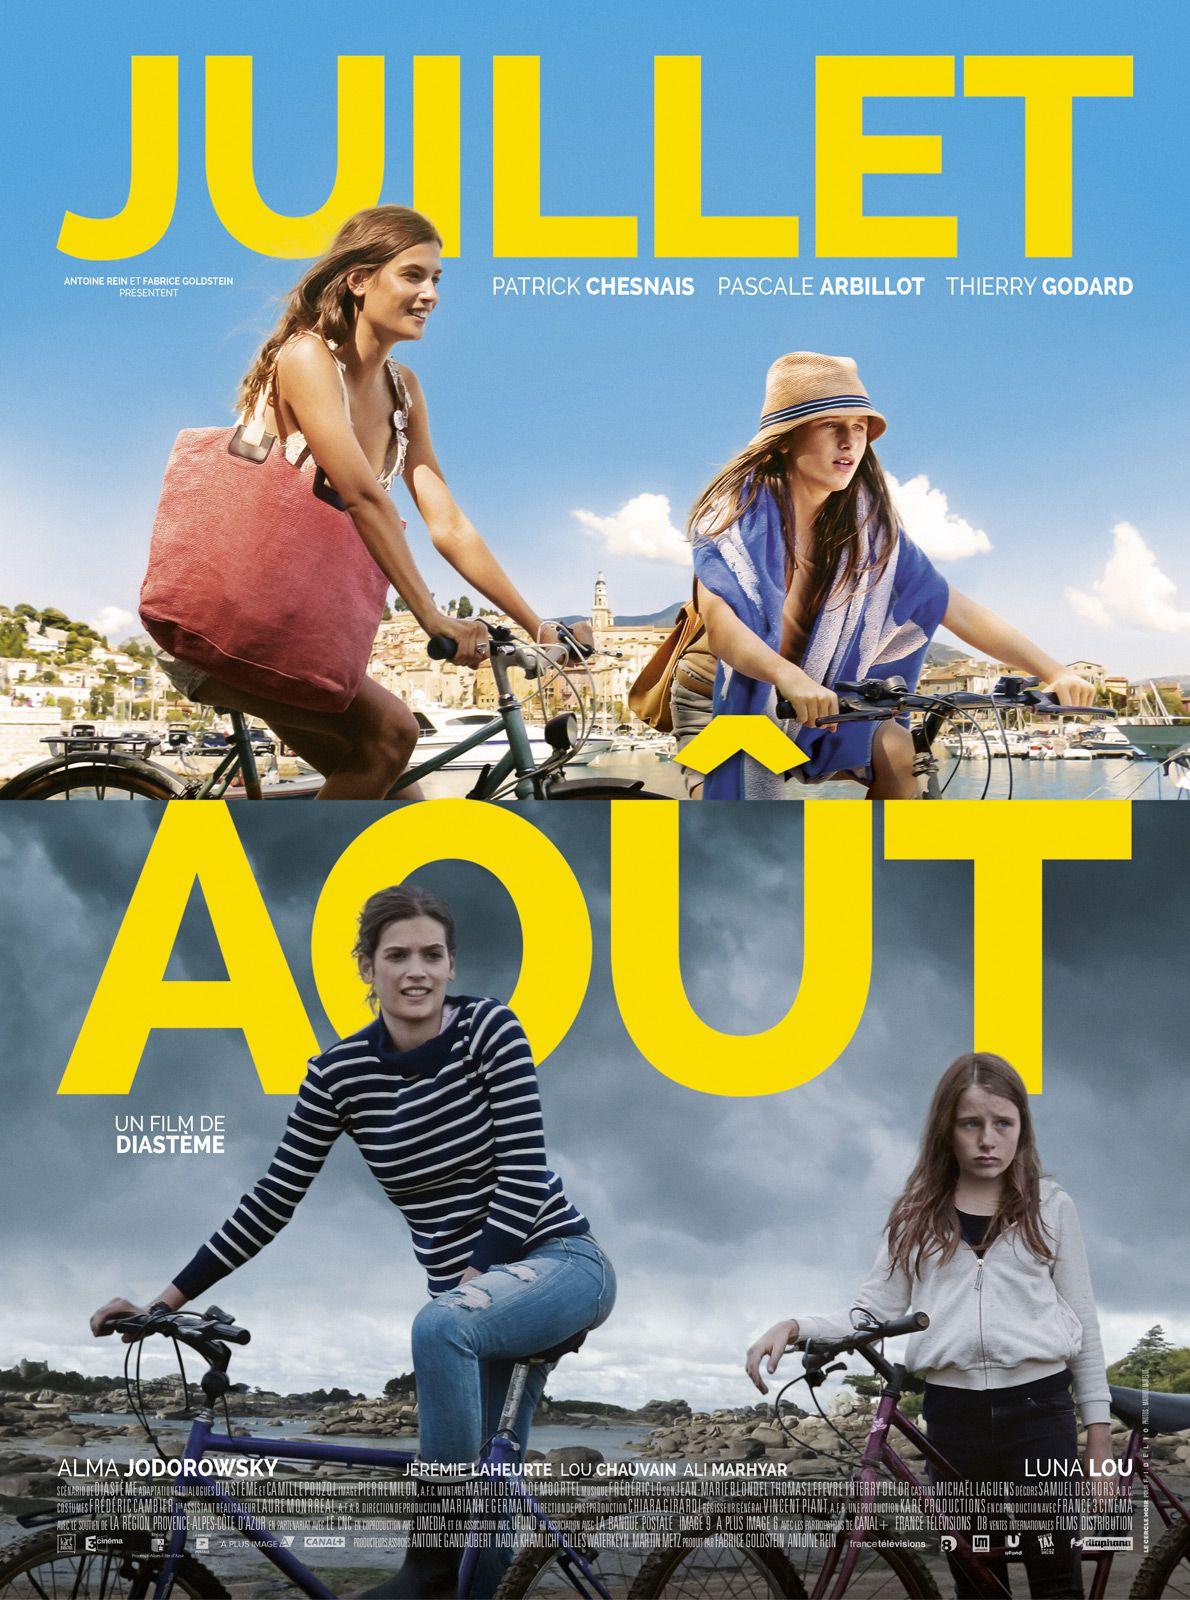 Juillet-Août - Film (2016)